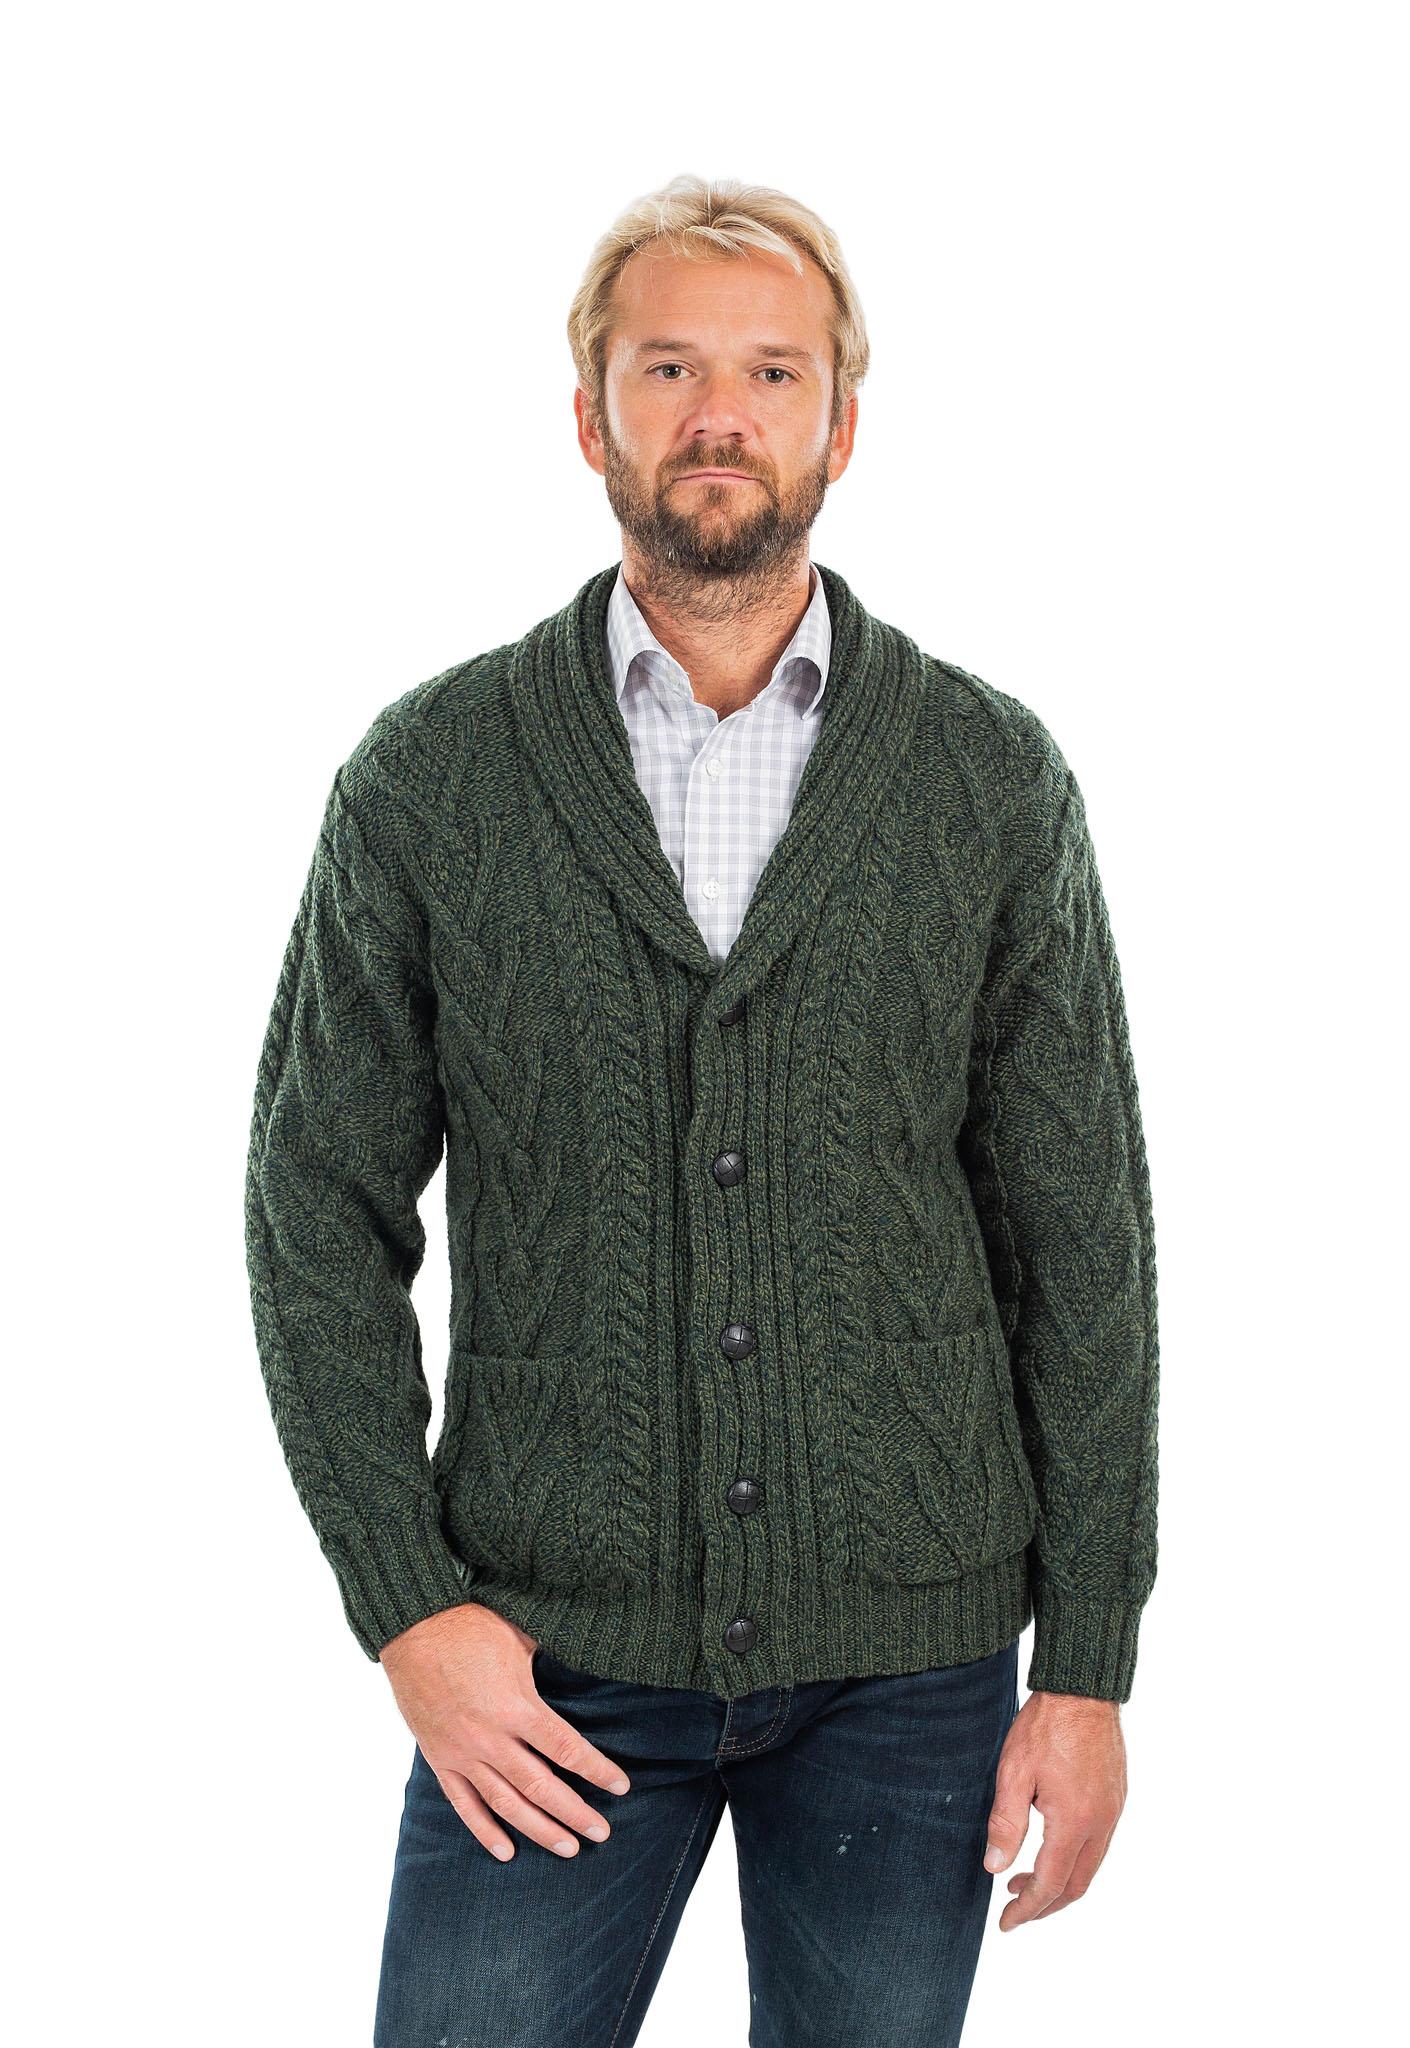 SAOL-Mens-Irish-Merino-Wool-Cardigan-Shawl-Collar-Front-Pockets-Aran-Cable-Knit thumbnail 12